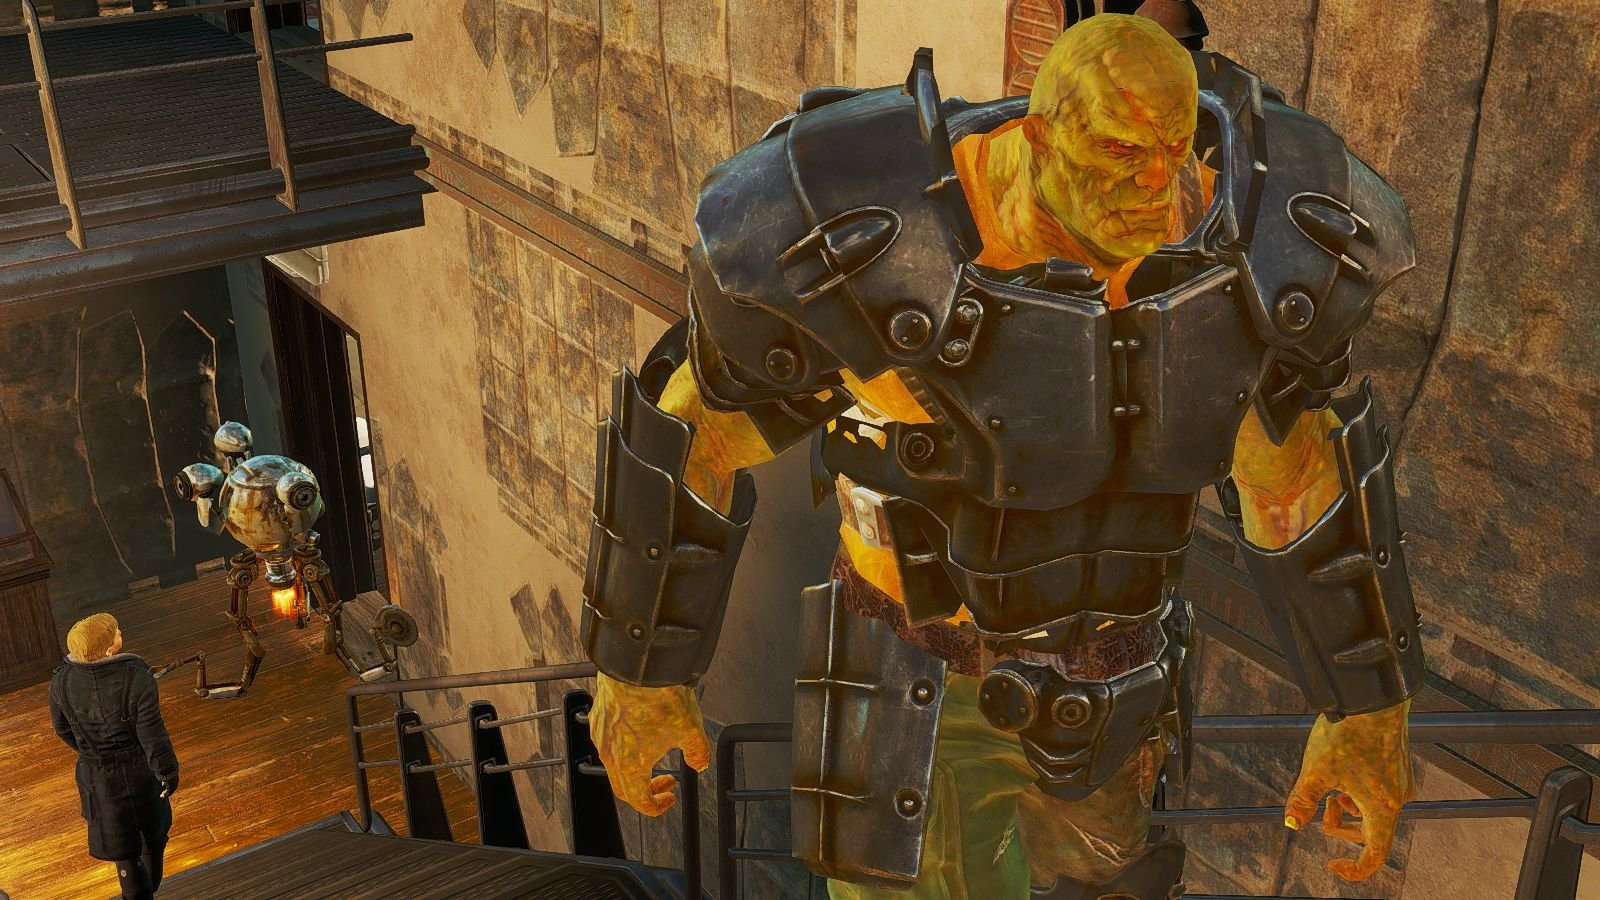 В бункере Братства Золота. Fallout-4 (Сборка 6.4)